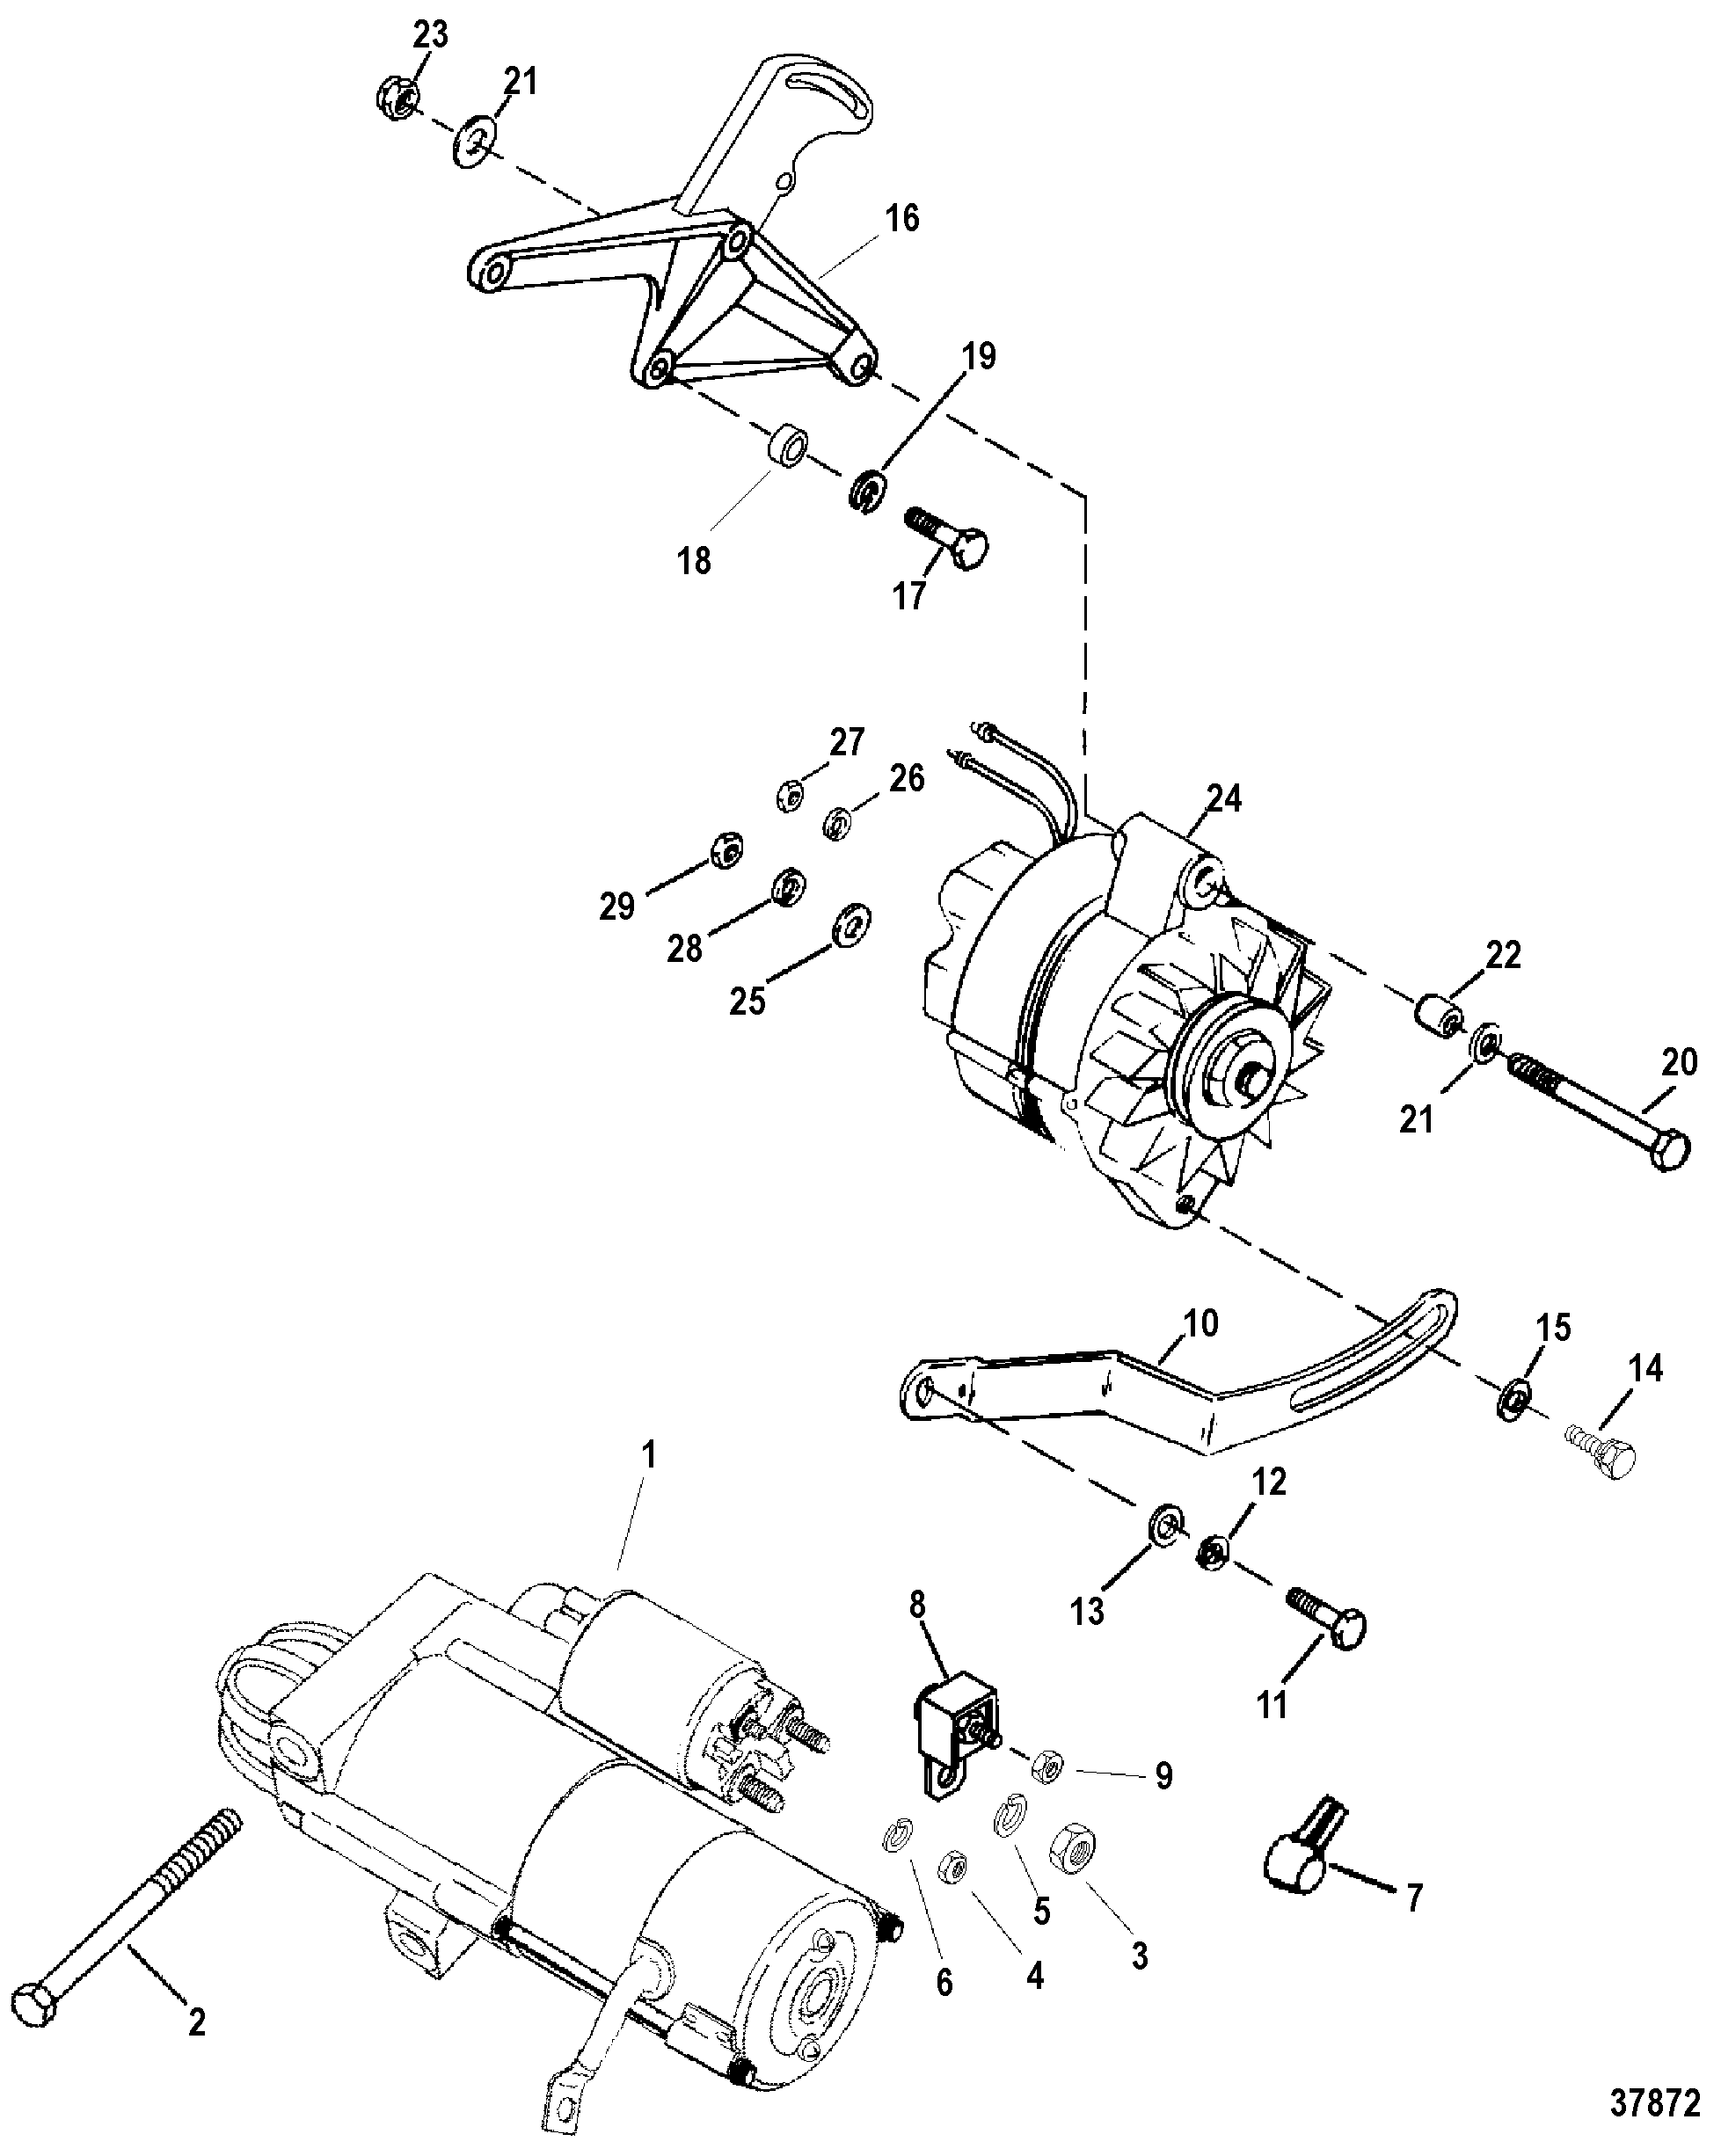 Motorola Marine Alternator N A Wiring Diagram on